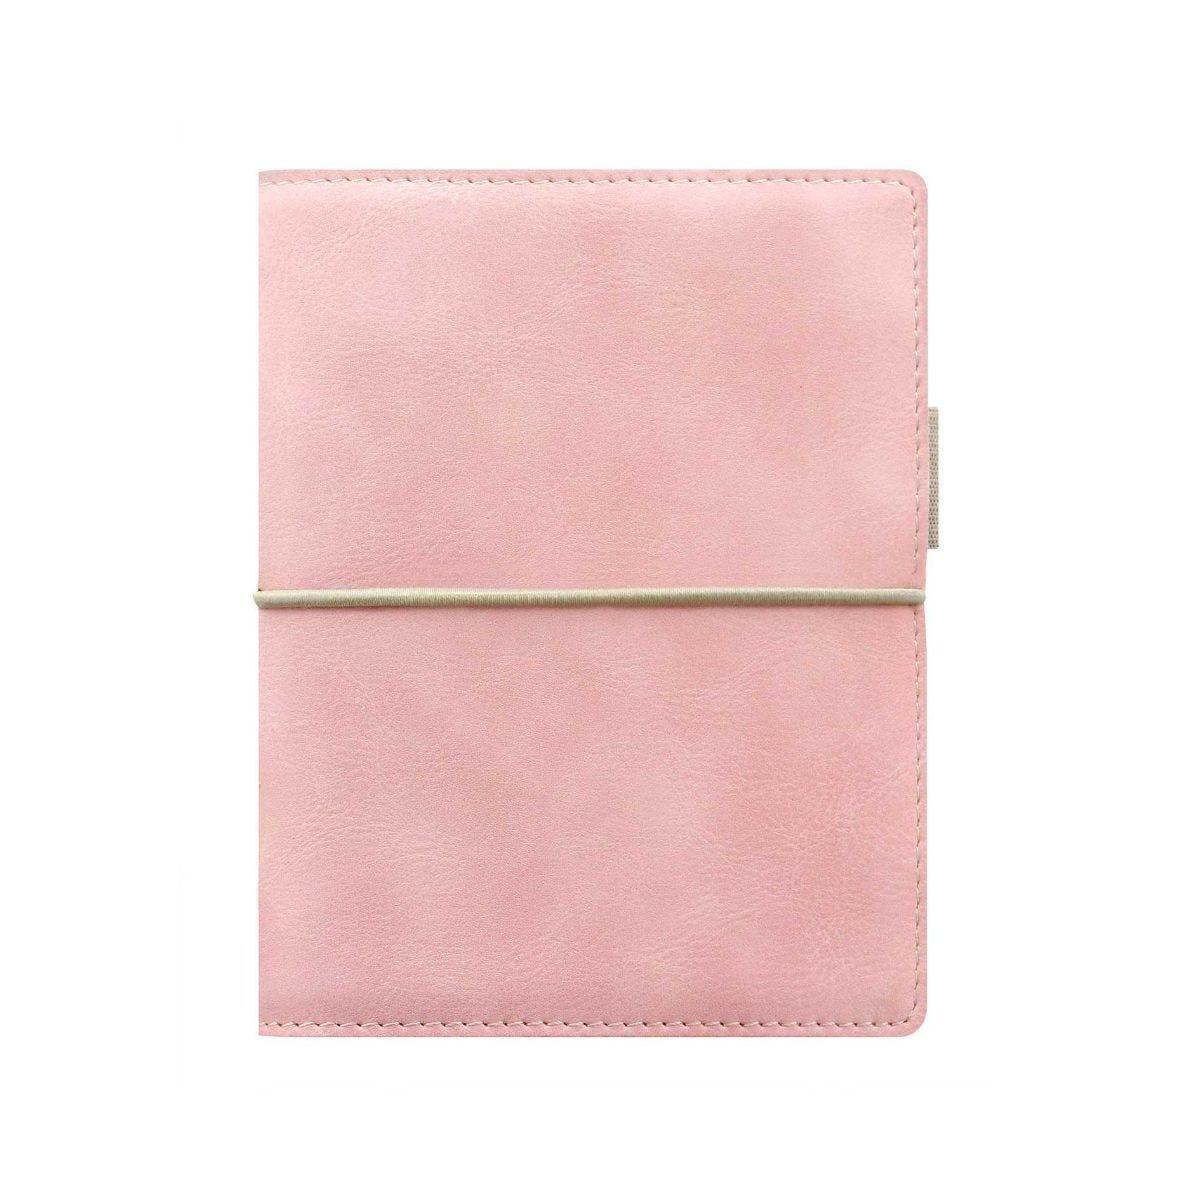 Filofax Pocket Domino Soft Organiser Soft pink